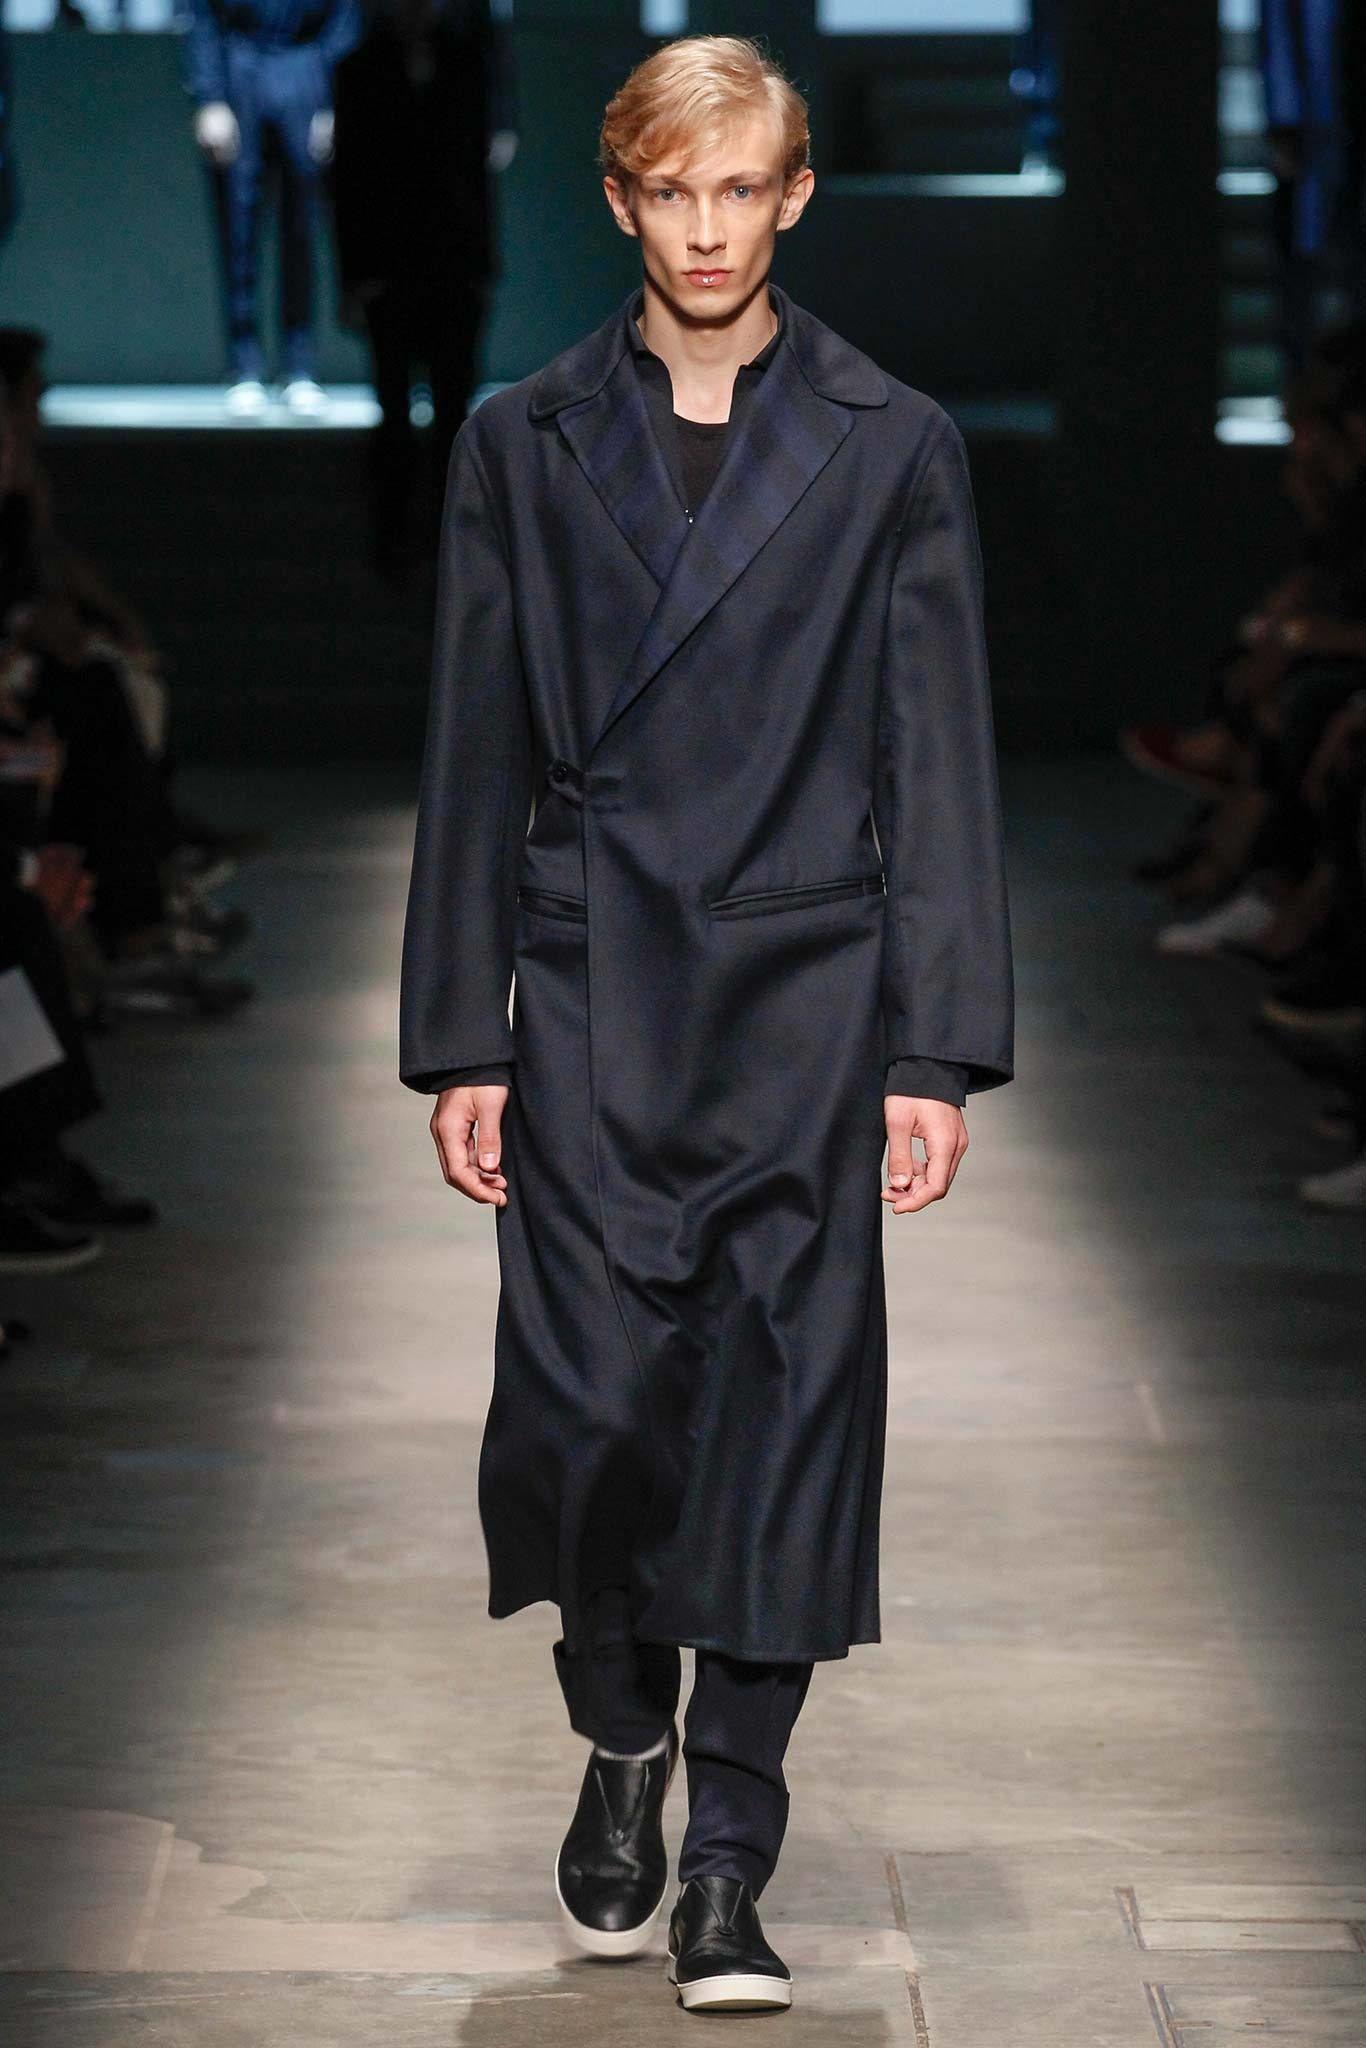 Ermenegildo Zegna Spring 2015 Menswear Fashion Show